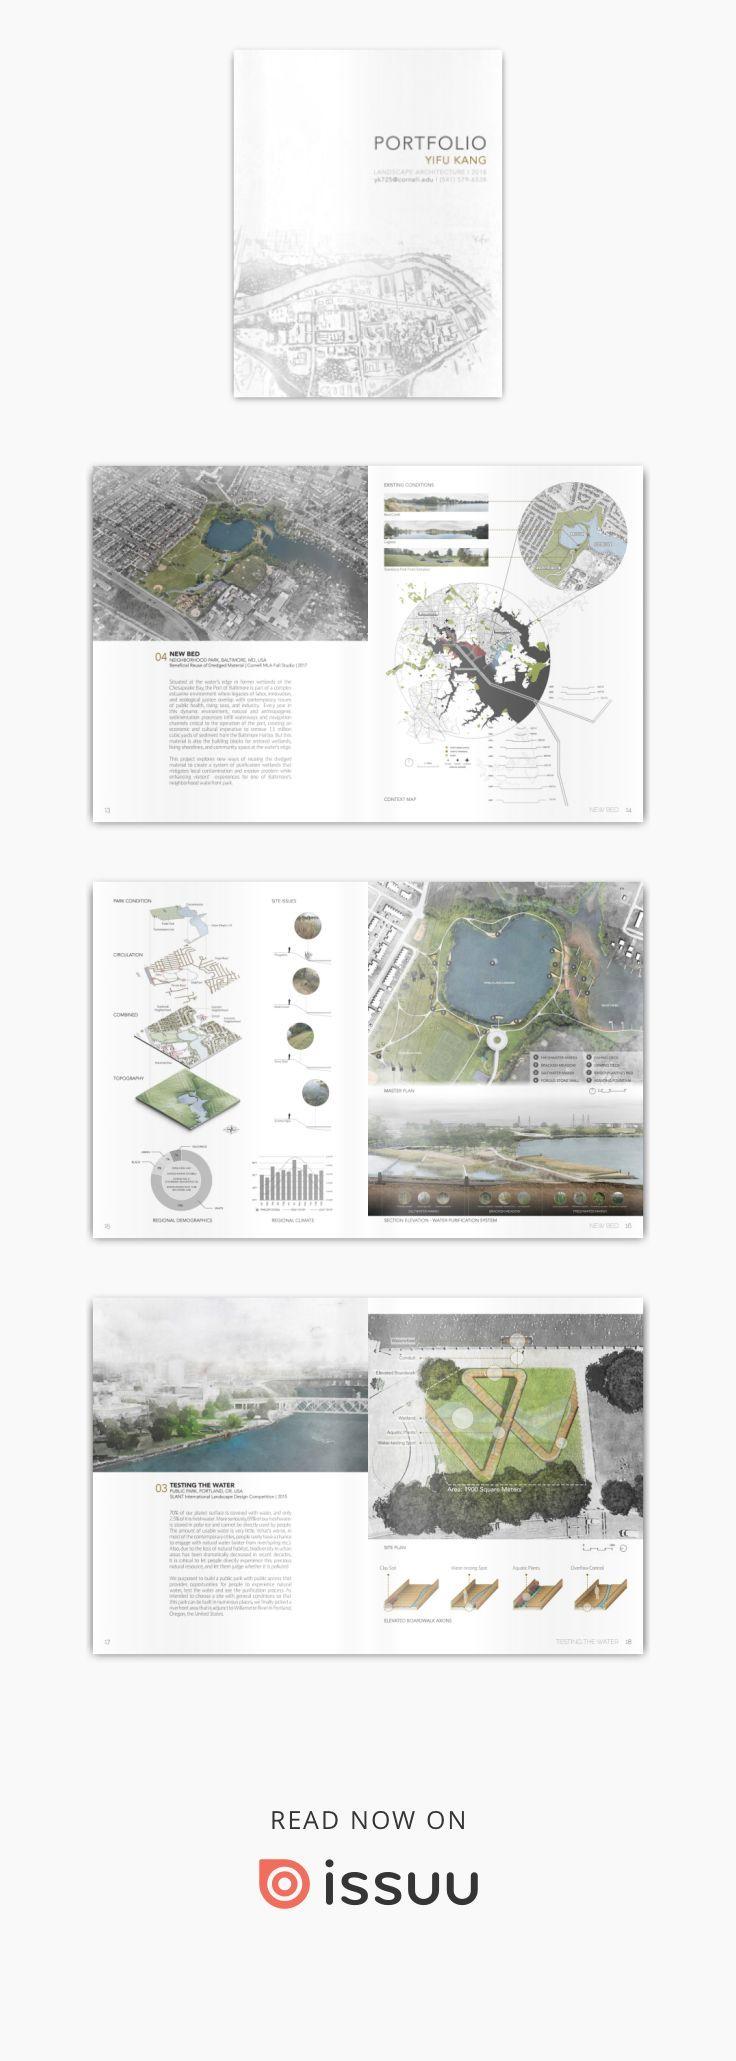 Yifu Kang Landscape Architecture Portfolio Cornell MLA 2018  2018 MLA | Cornell University; 2016 BLA | University of Oregon